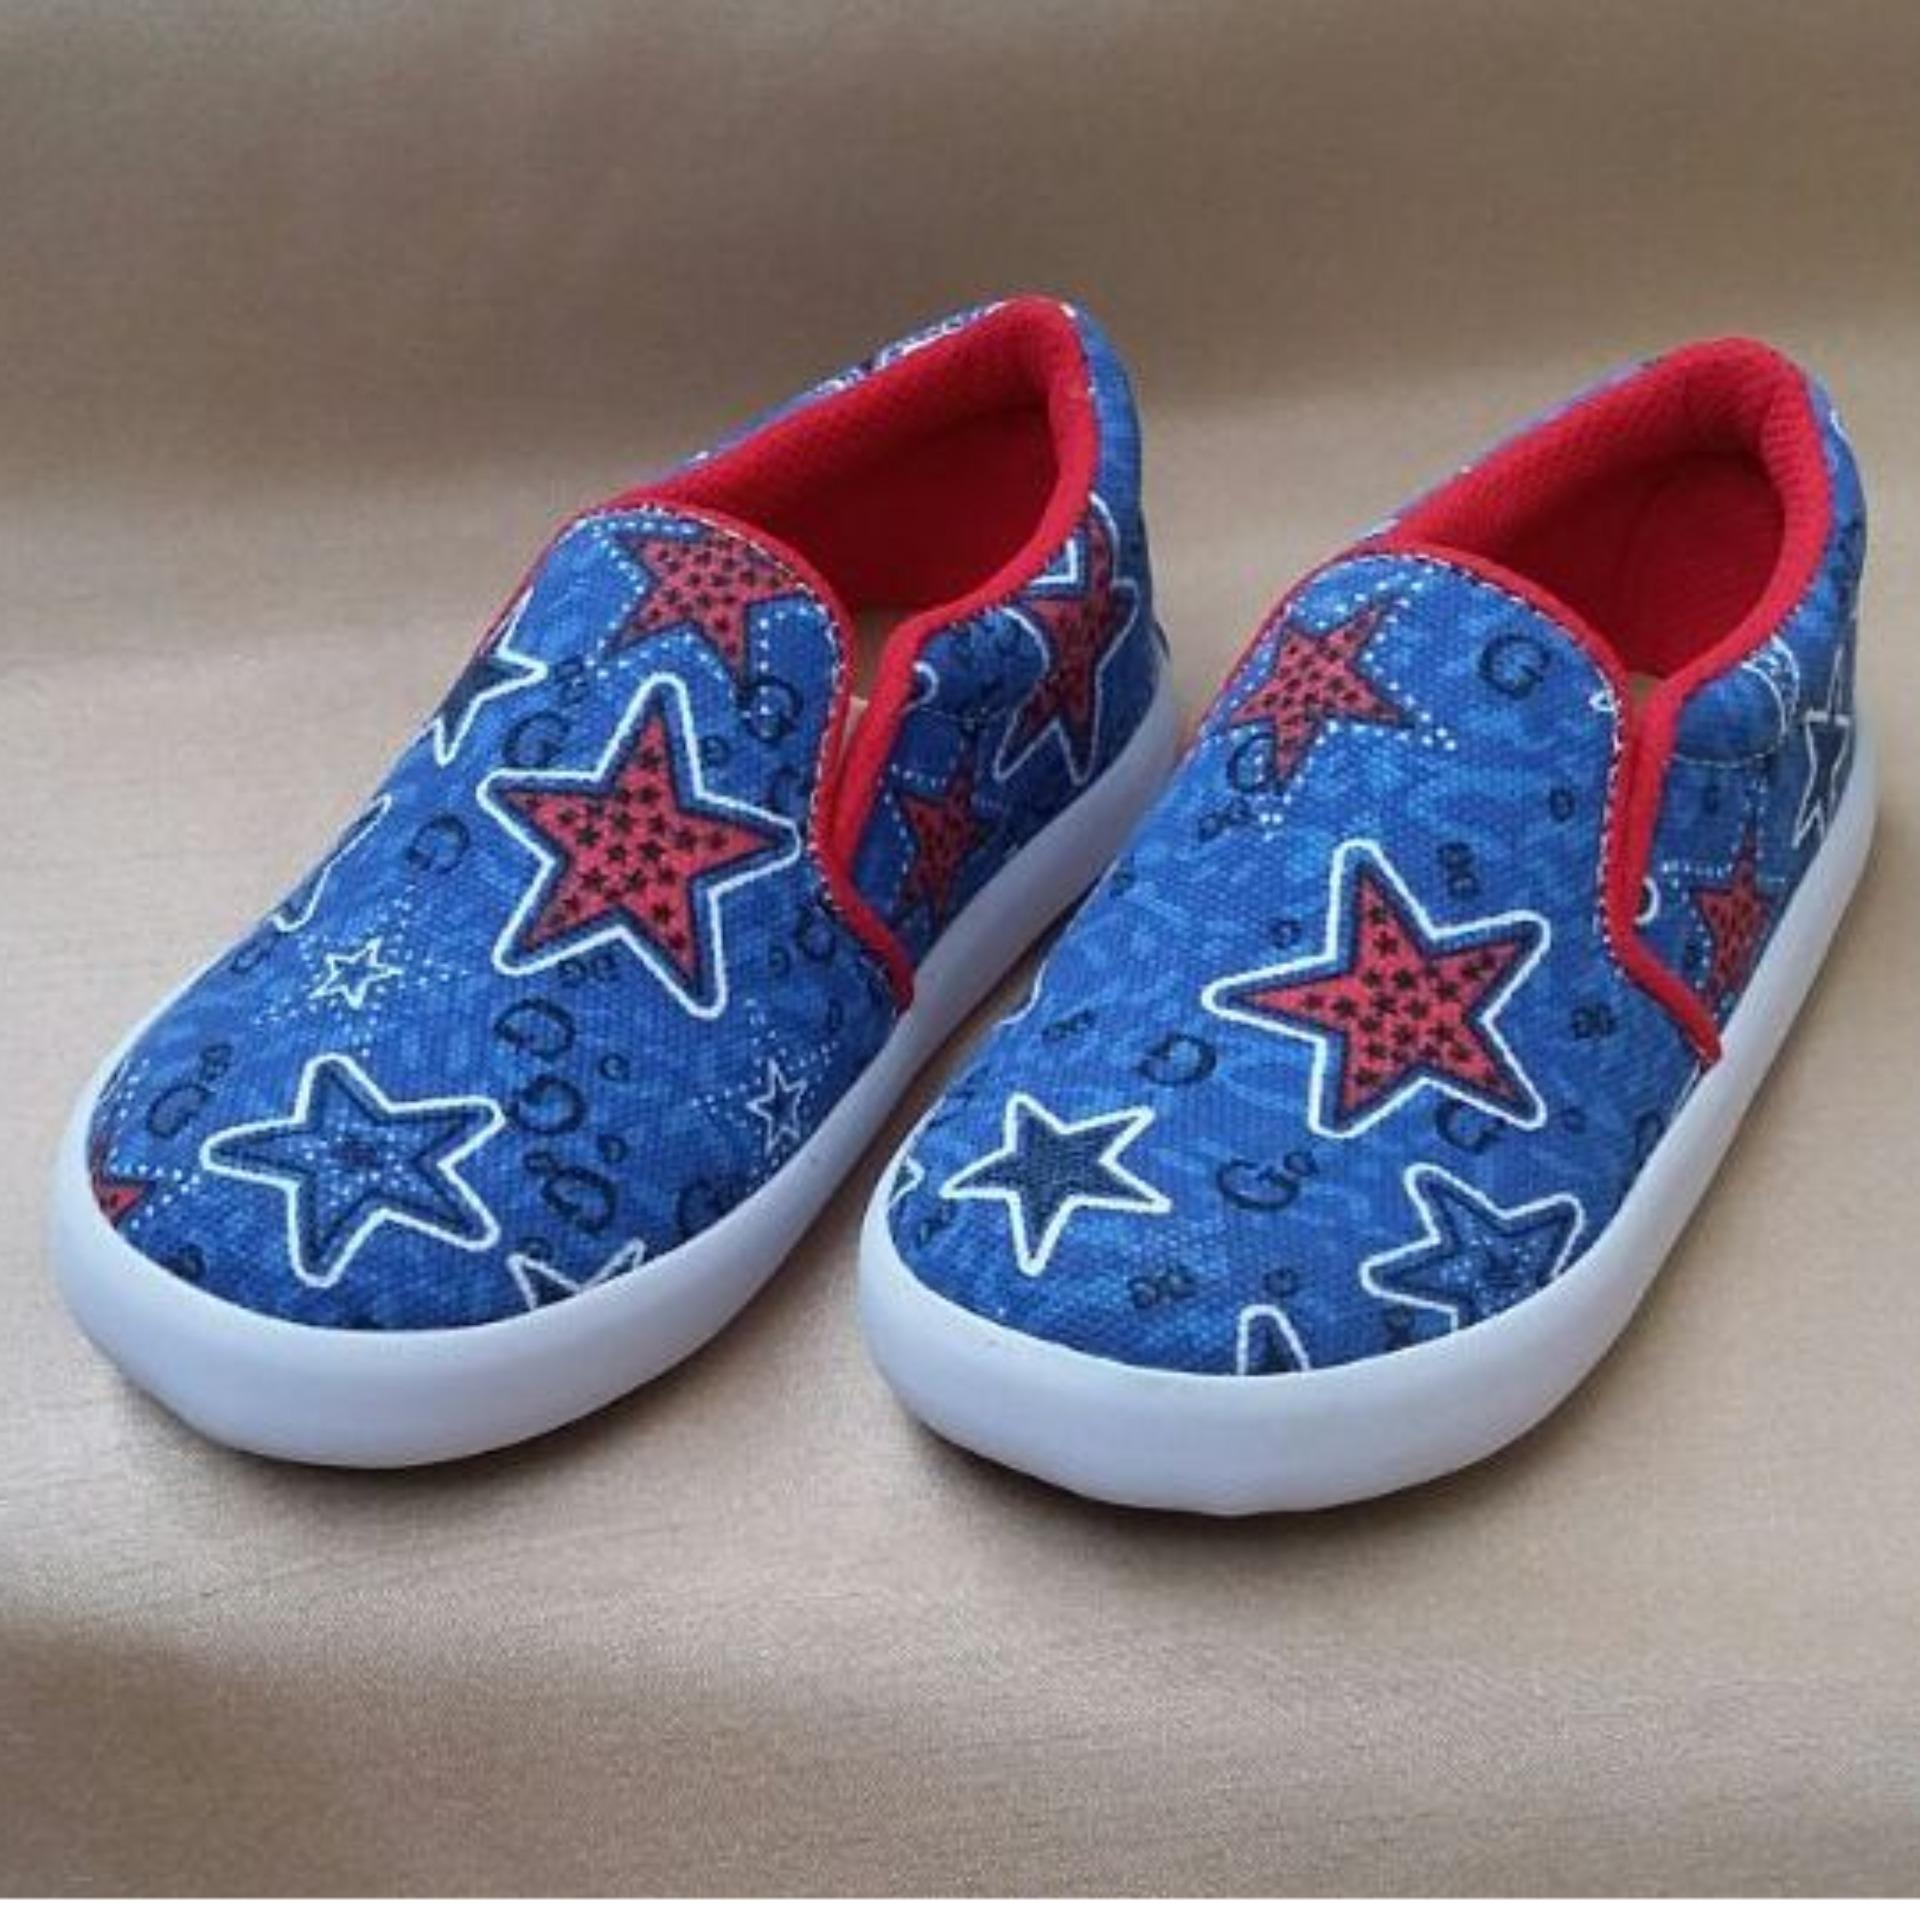 Daftar Harga Sepatu Anak Laki Laki Model Slip On Biru Merah Motif Bintang Biru Shuku